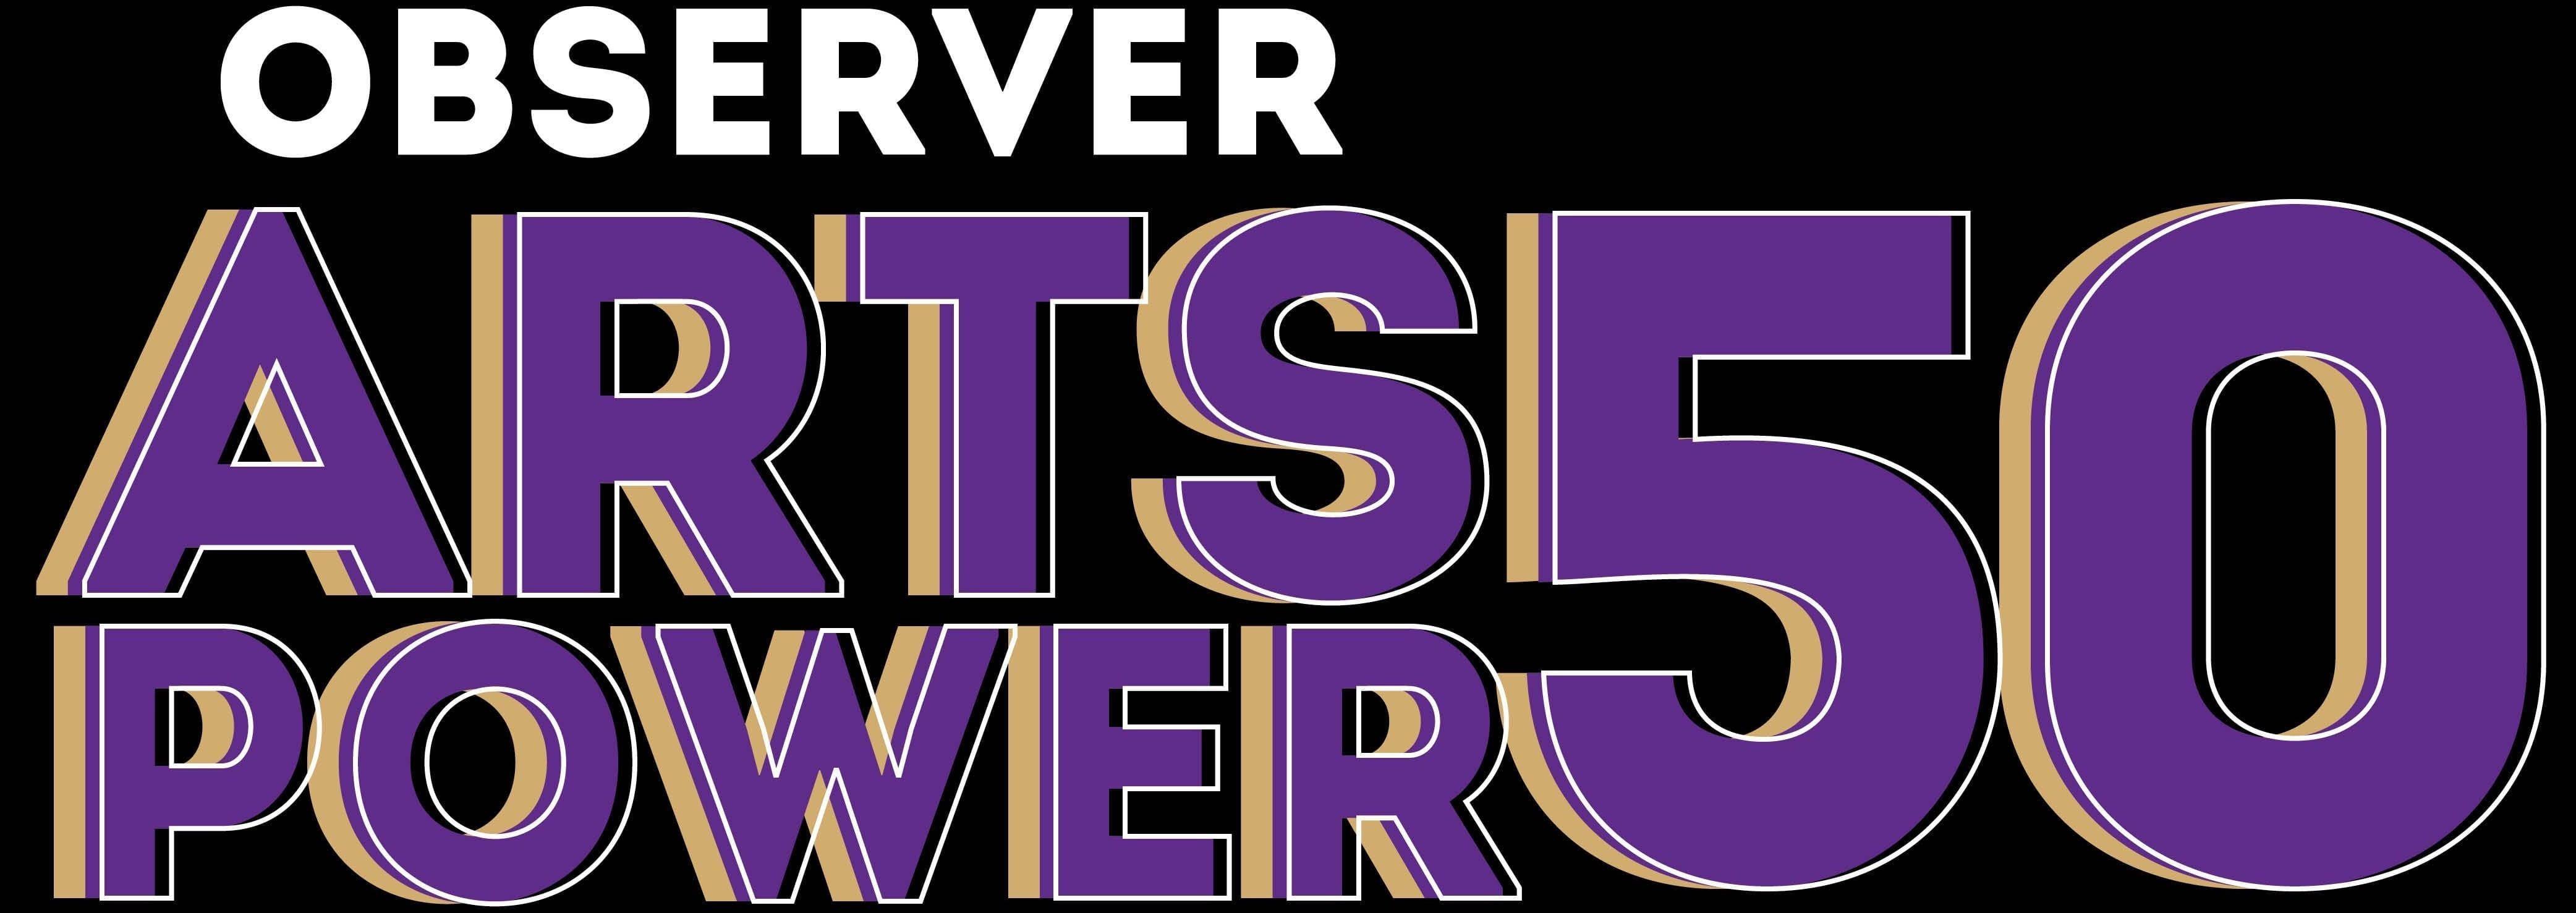 2021 Arts Power 50